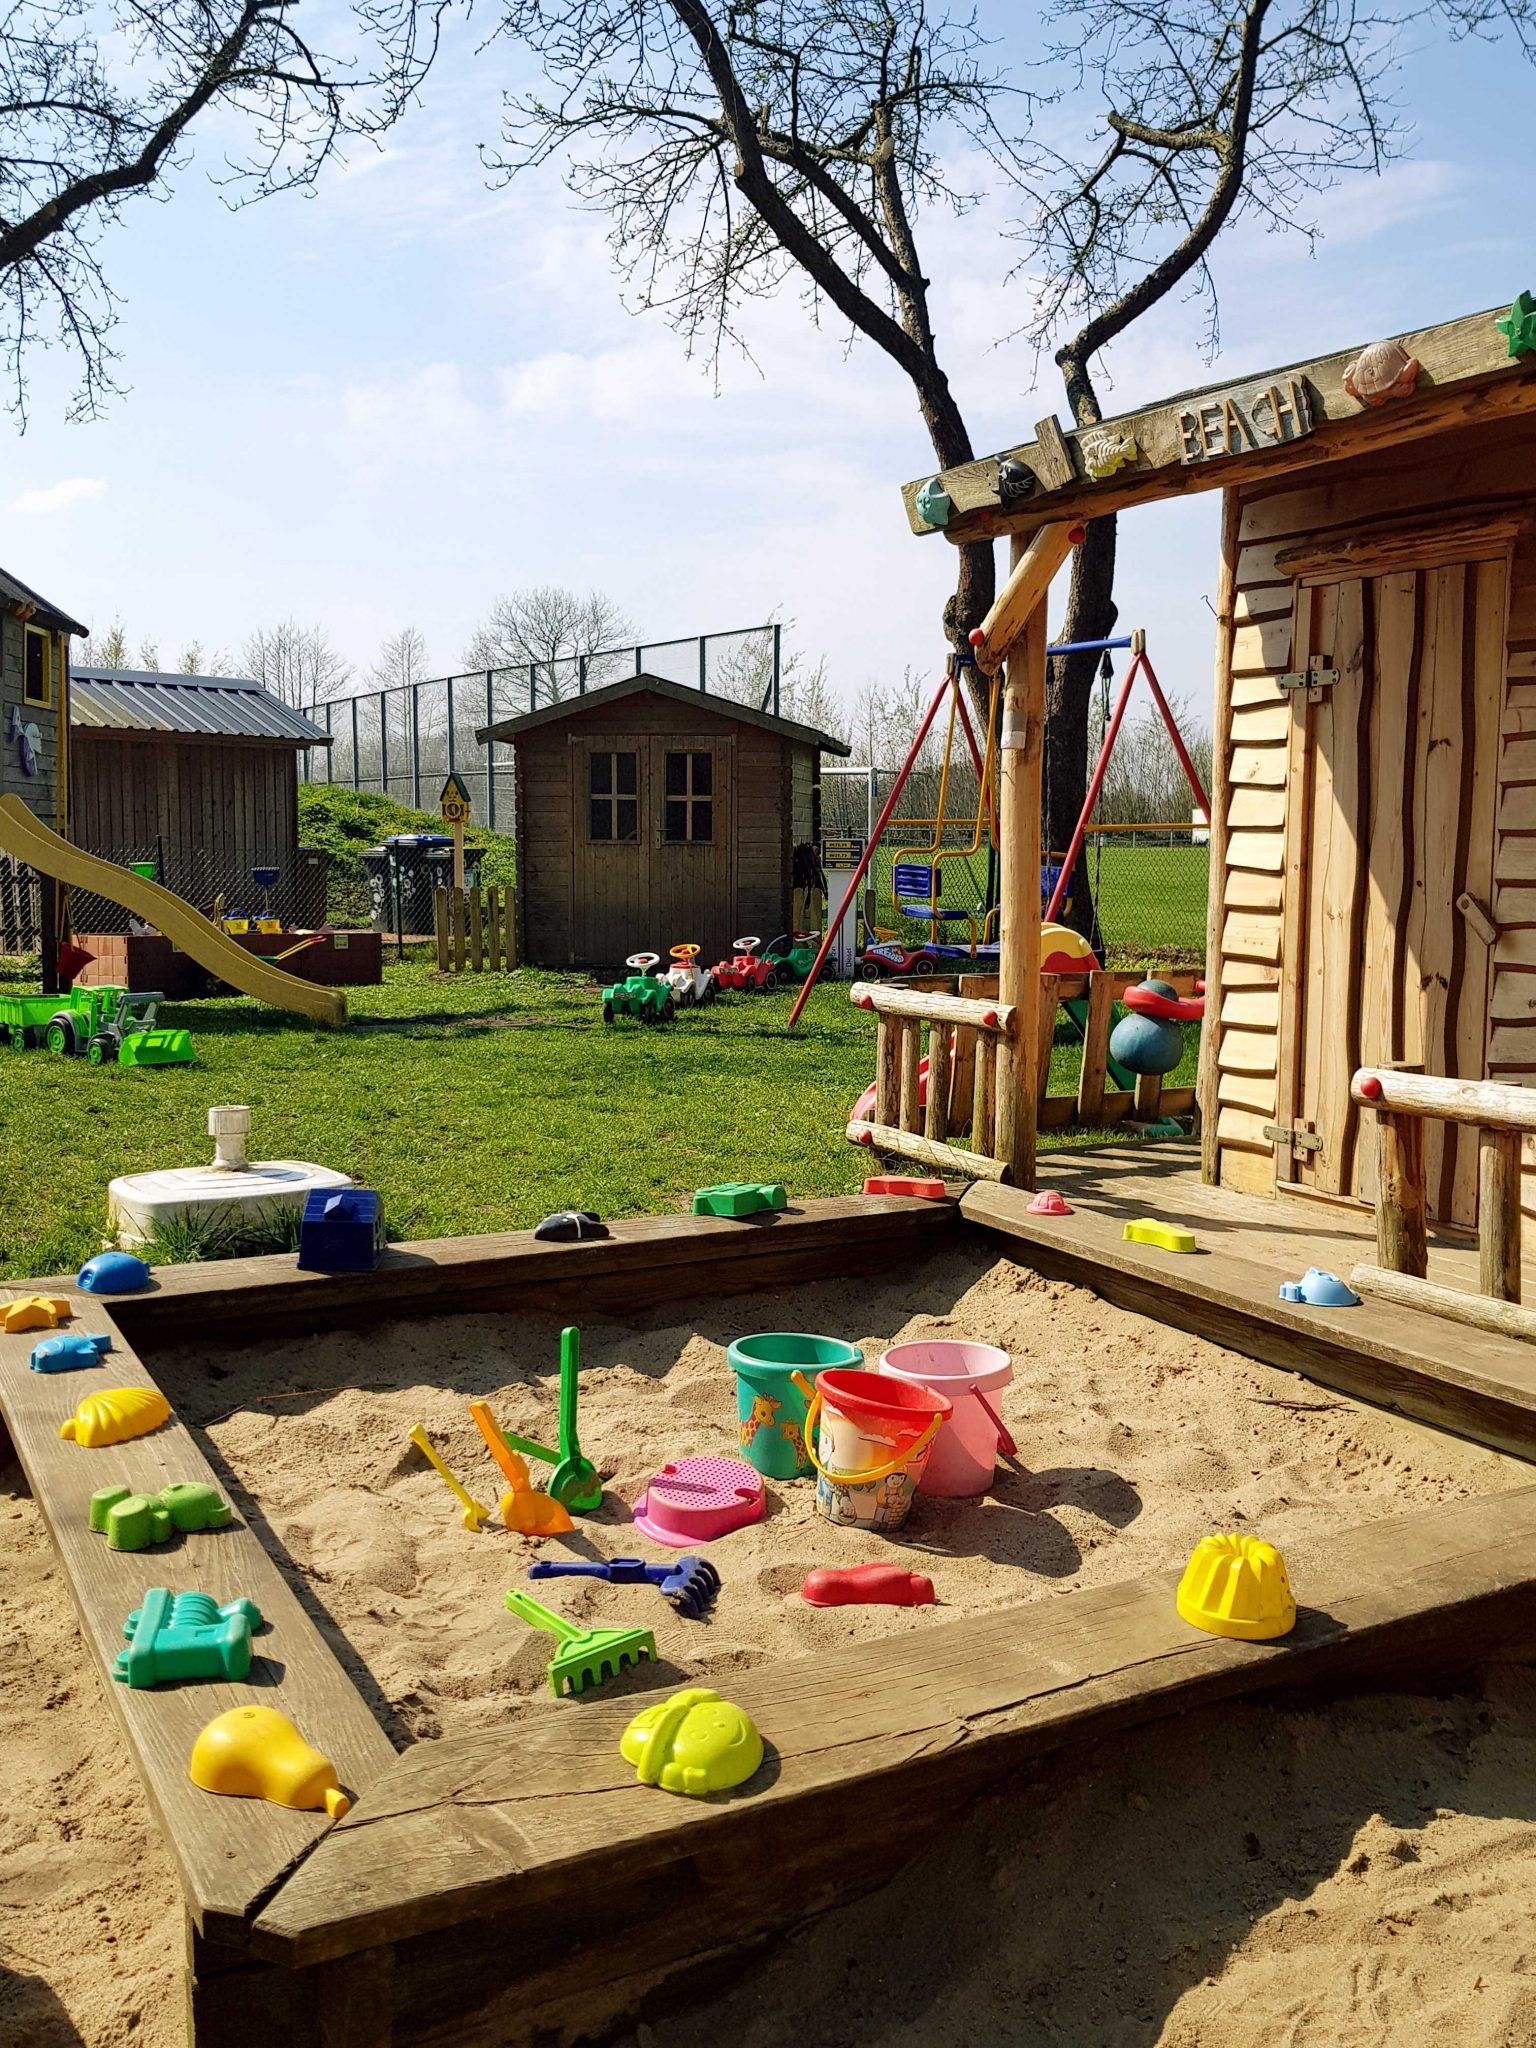 Kita Kid Zone Kinderbetreuung Garten1 26 - Kinder-Beachclub